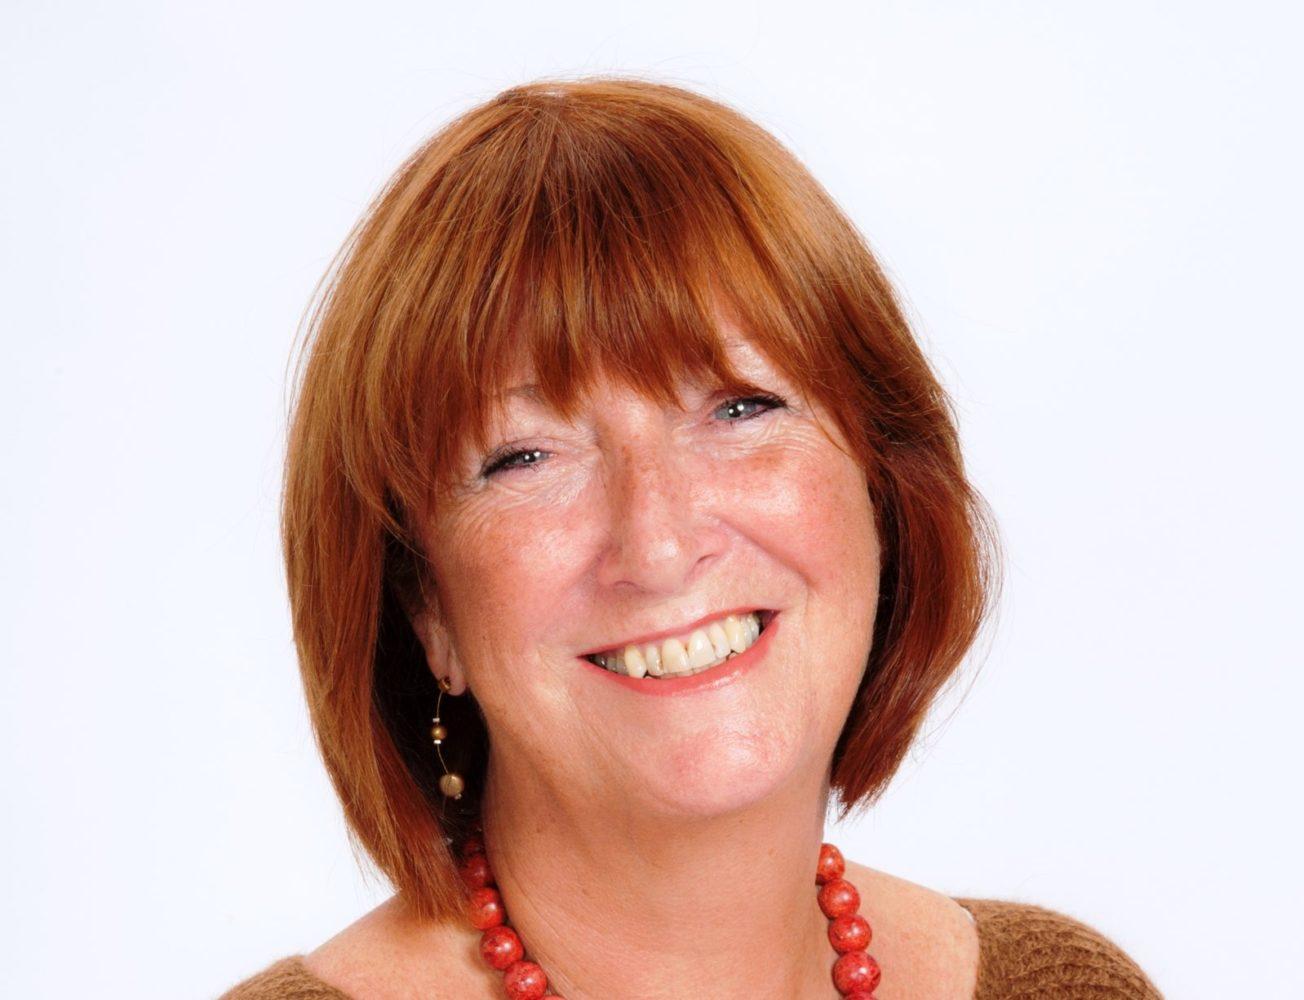 Labour councillor Vicki Pite has represented Chase ward since 2014